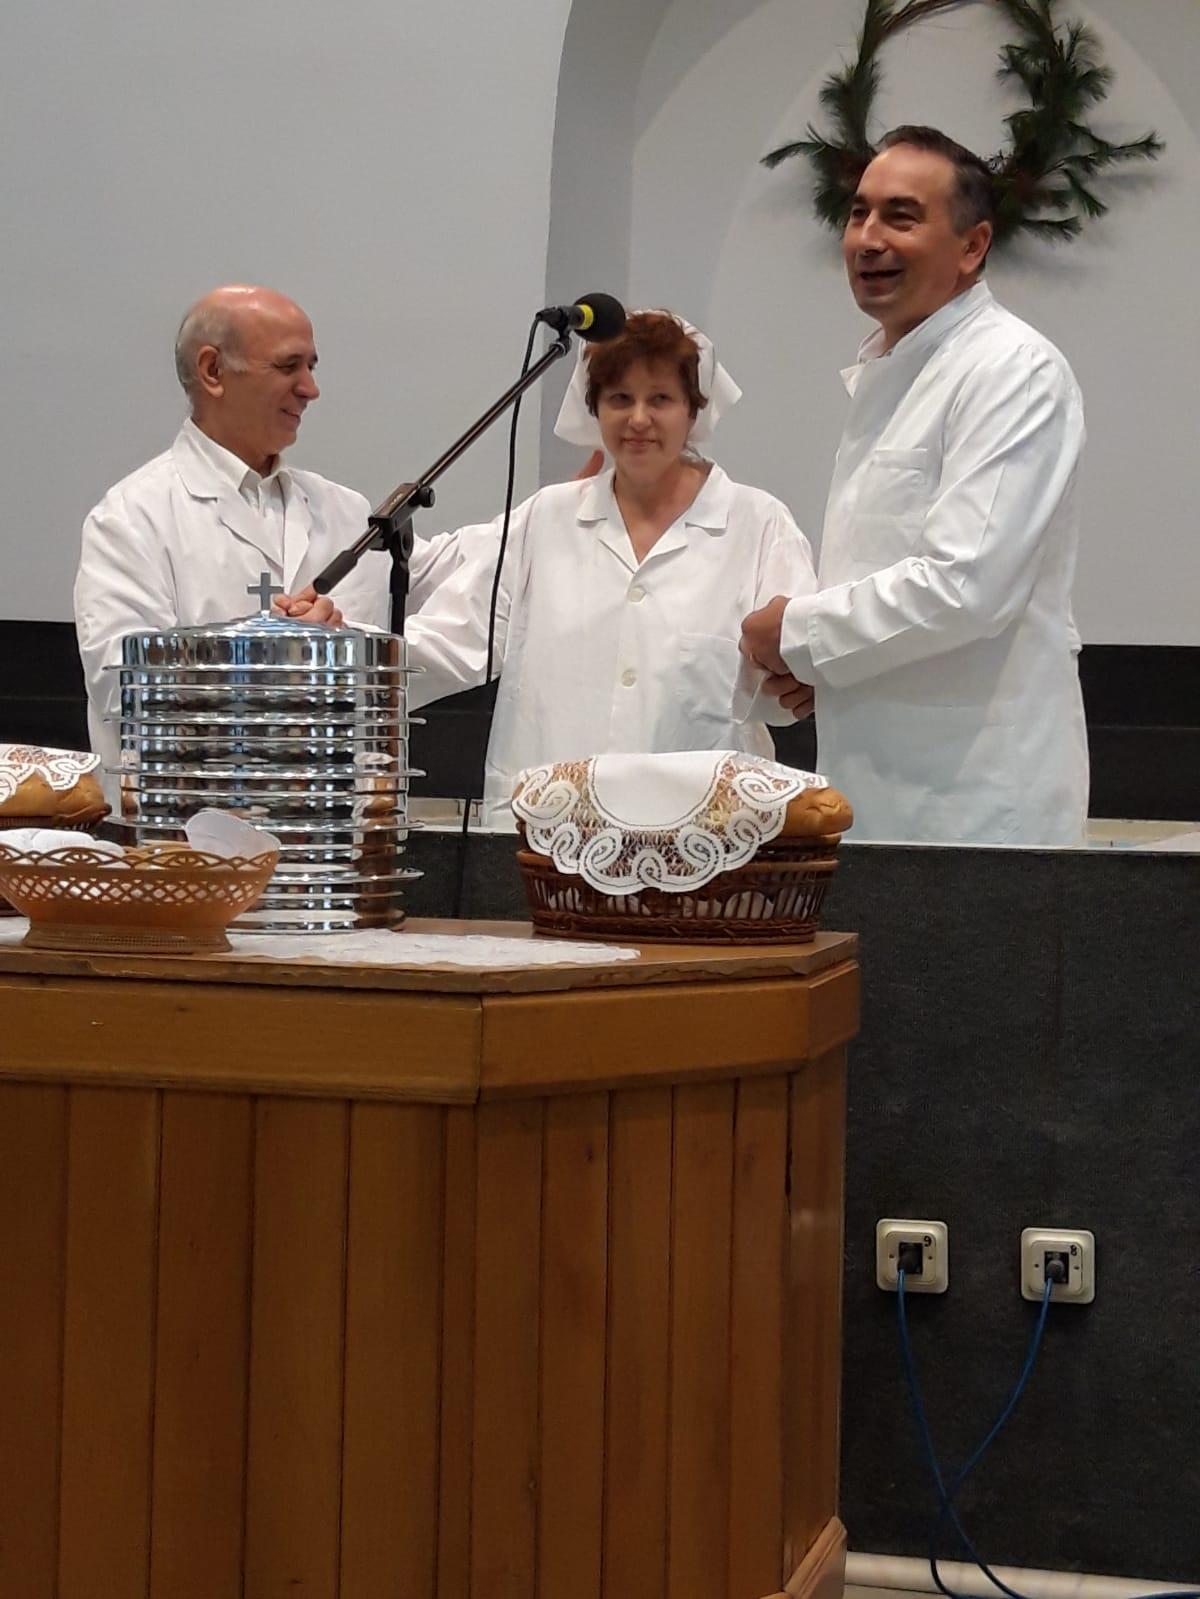 BISERICA ANTIOHIA BUCURESTI - SORA CARE A FOST BOTEZATA IN ZIUA DE DUMINICA 29 DECEMBRIE 2019